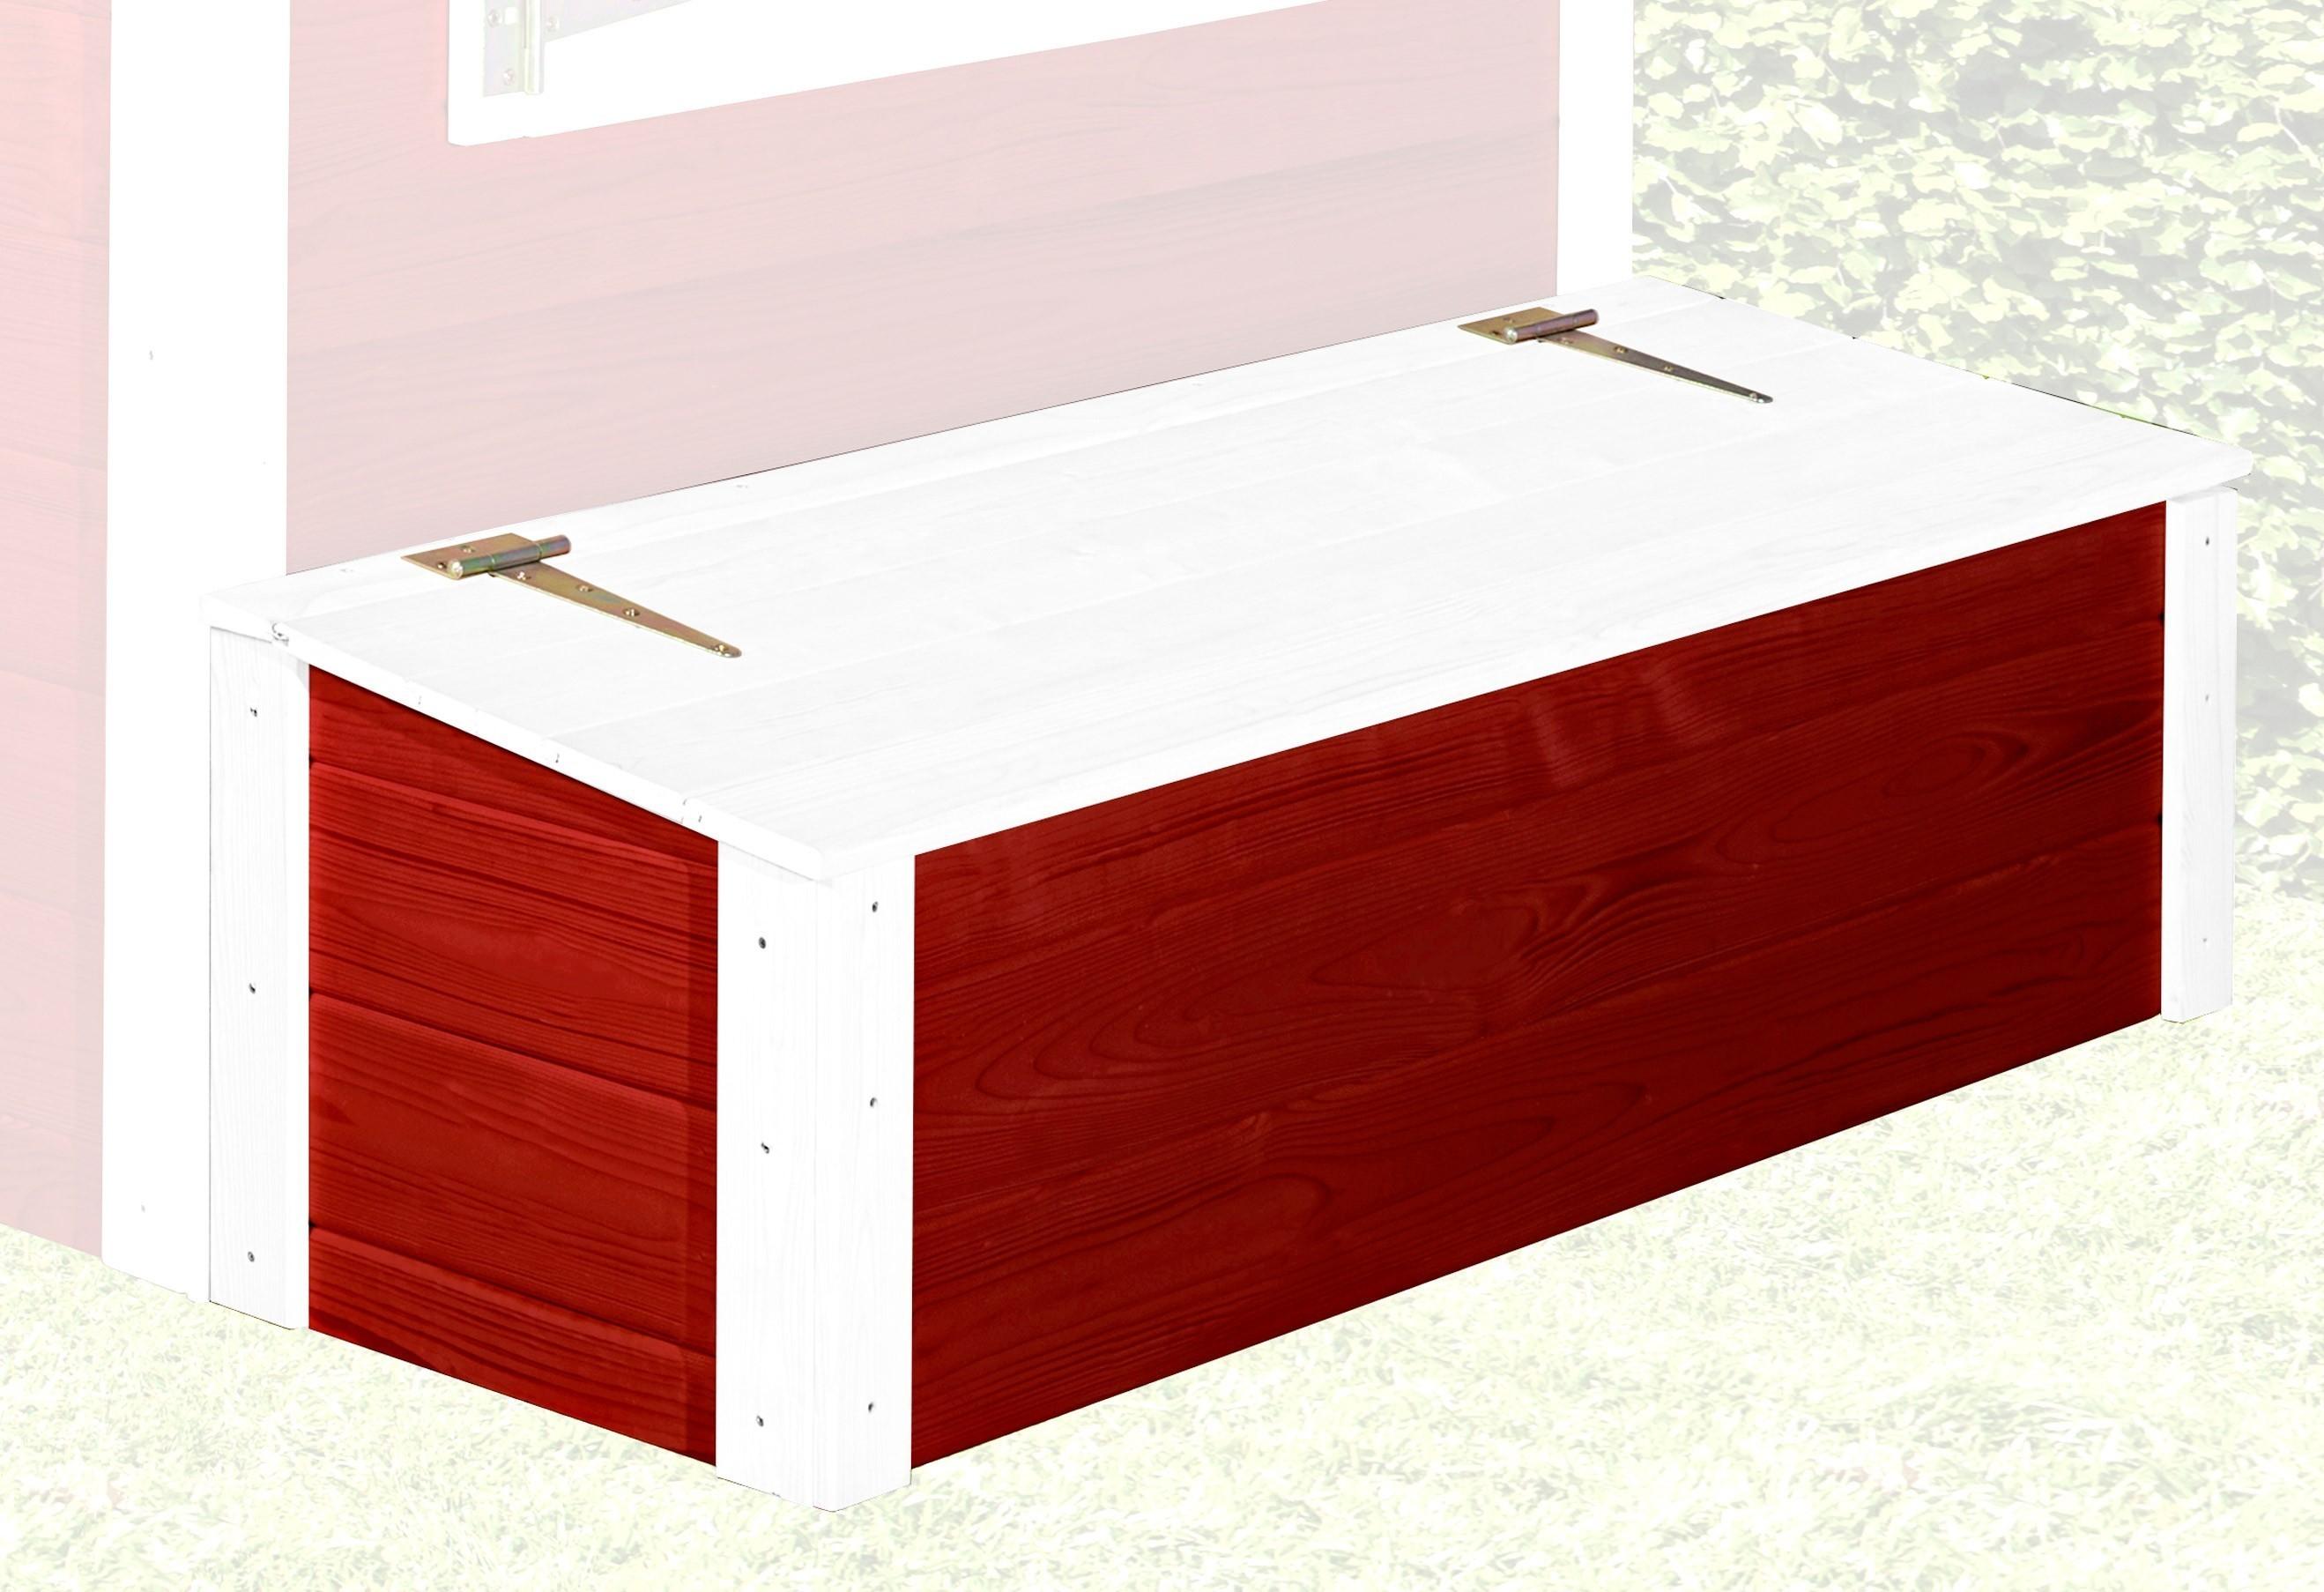 Schatztruhe für Kinderspielhaus Tabaluga Drachenhöhle rot 120x35cm Bild 1